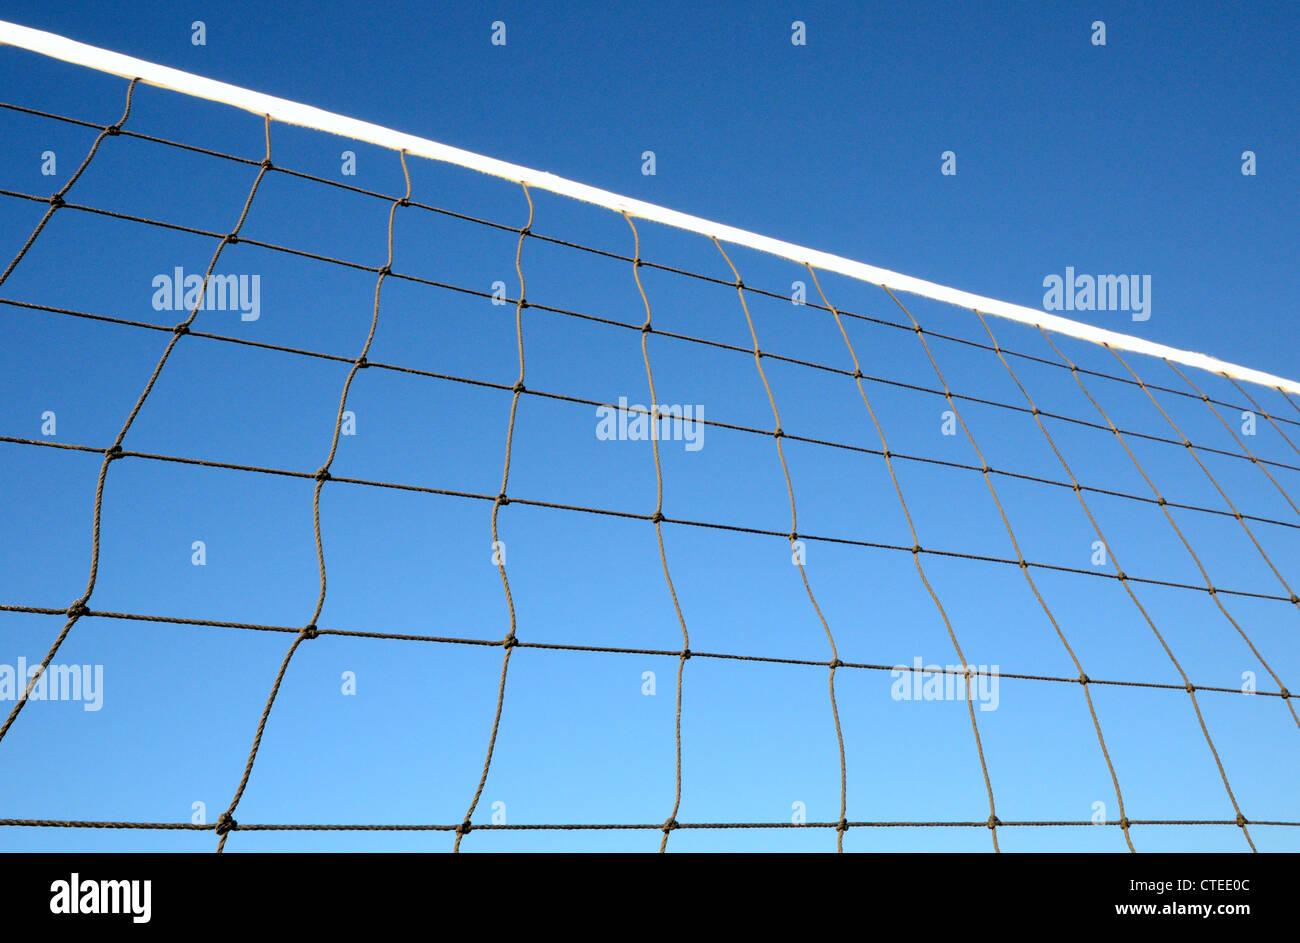 Partie de volley-ball net contre ciel bleu clair Photo Stock